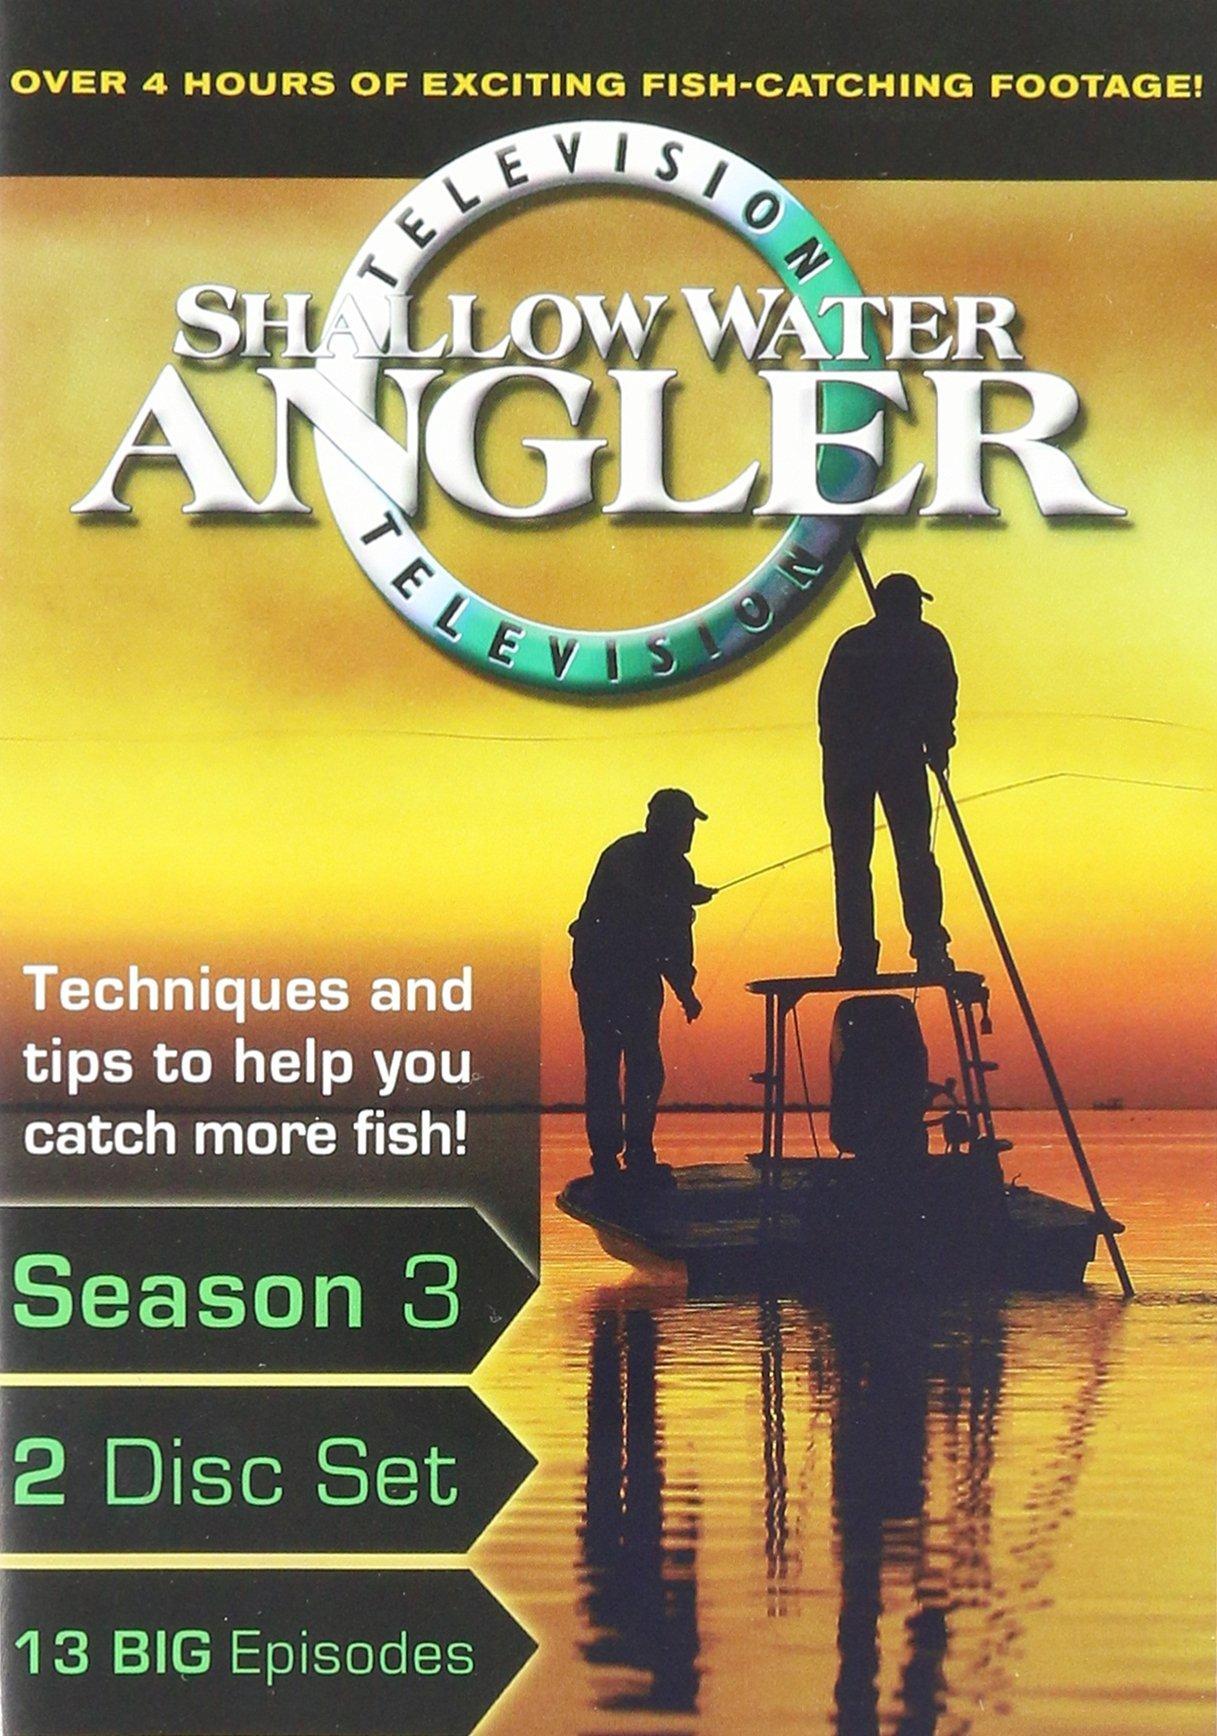 Shallow Water Angler TV Season 2 (2007) 2 DVD Se3